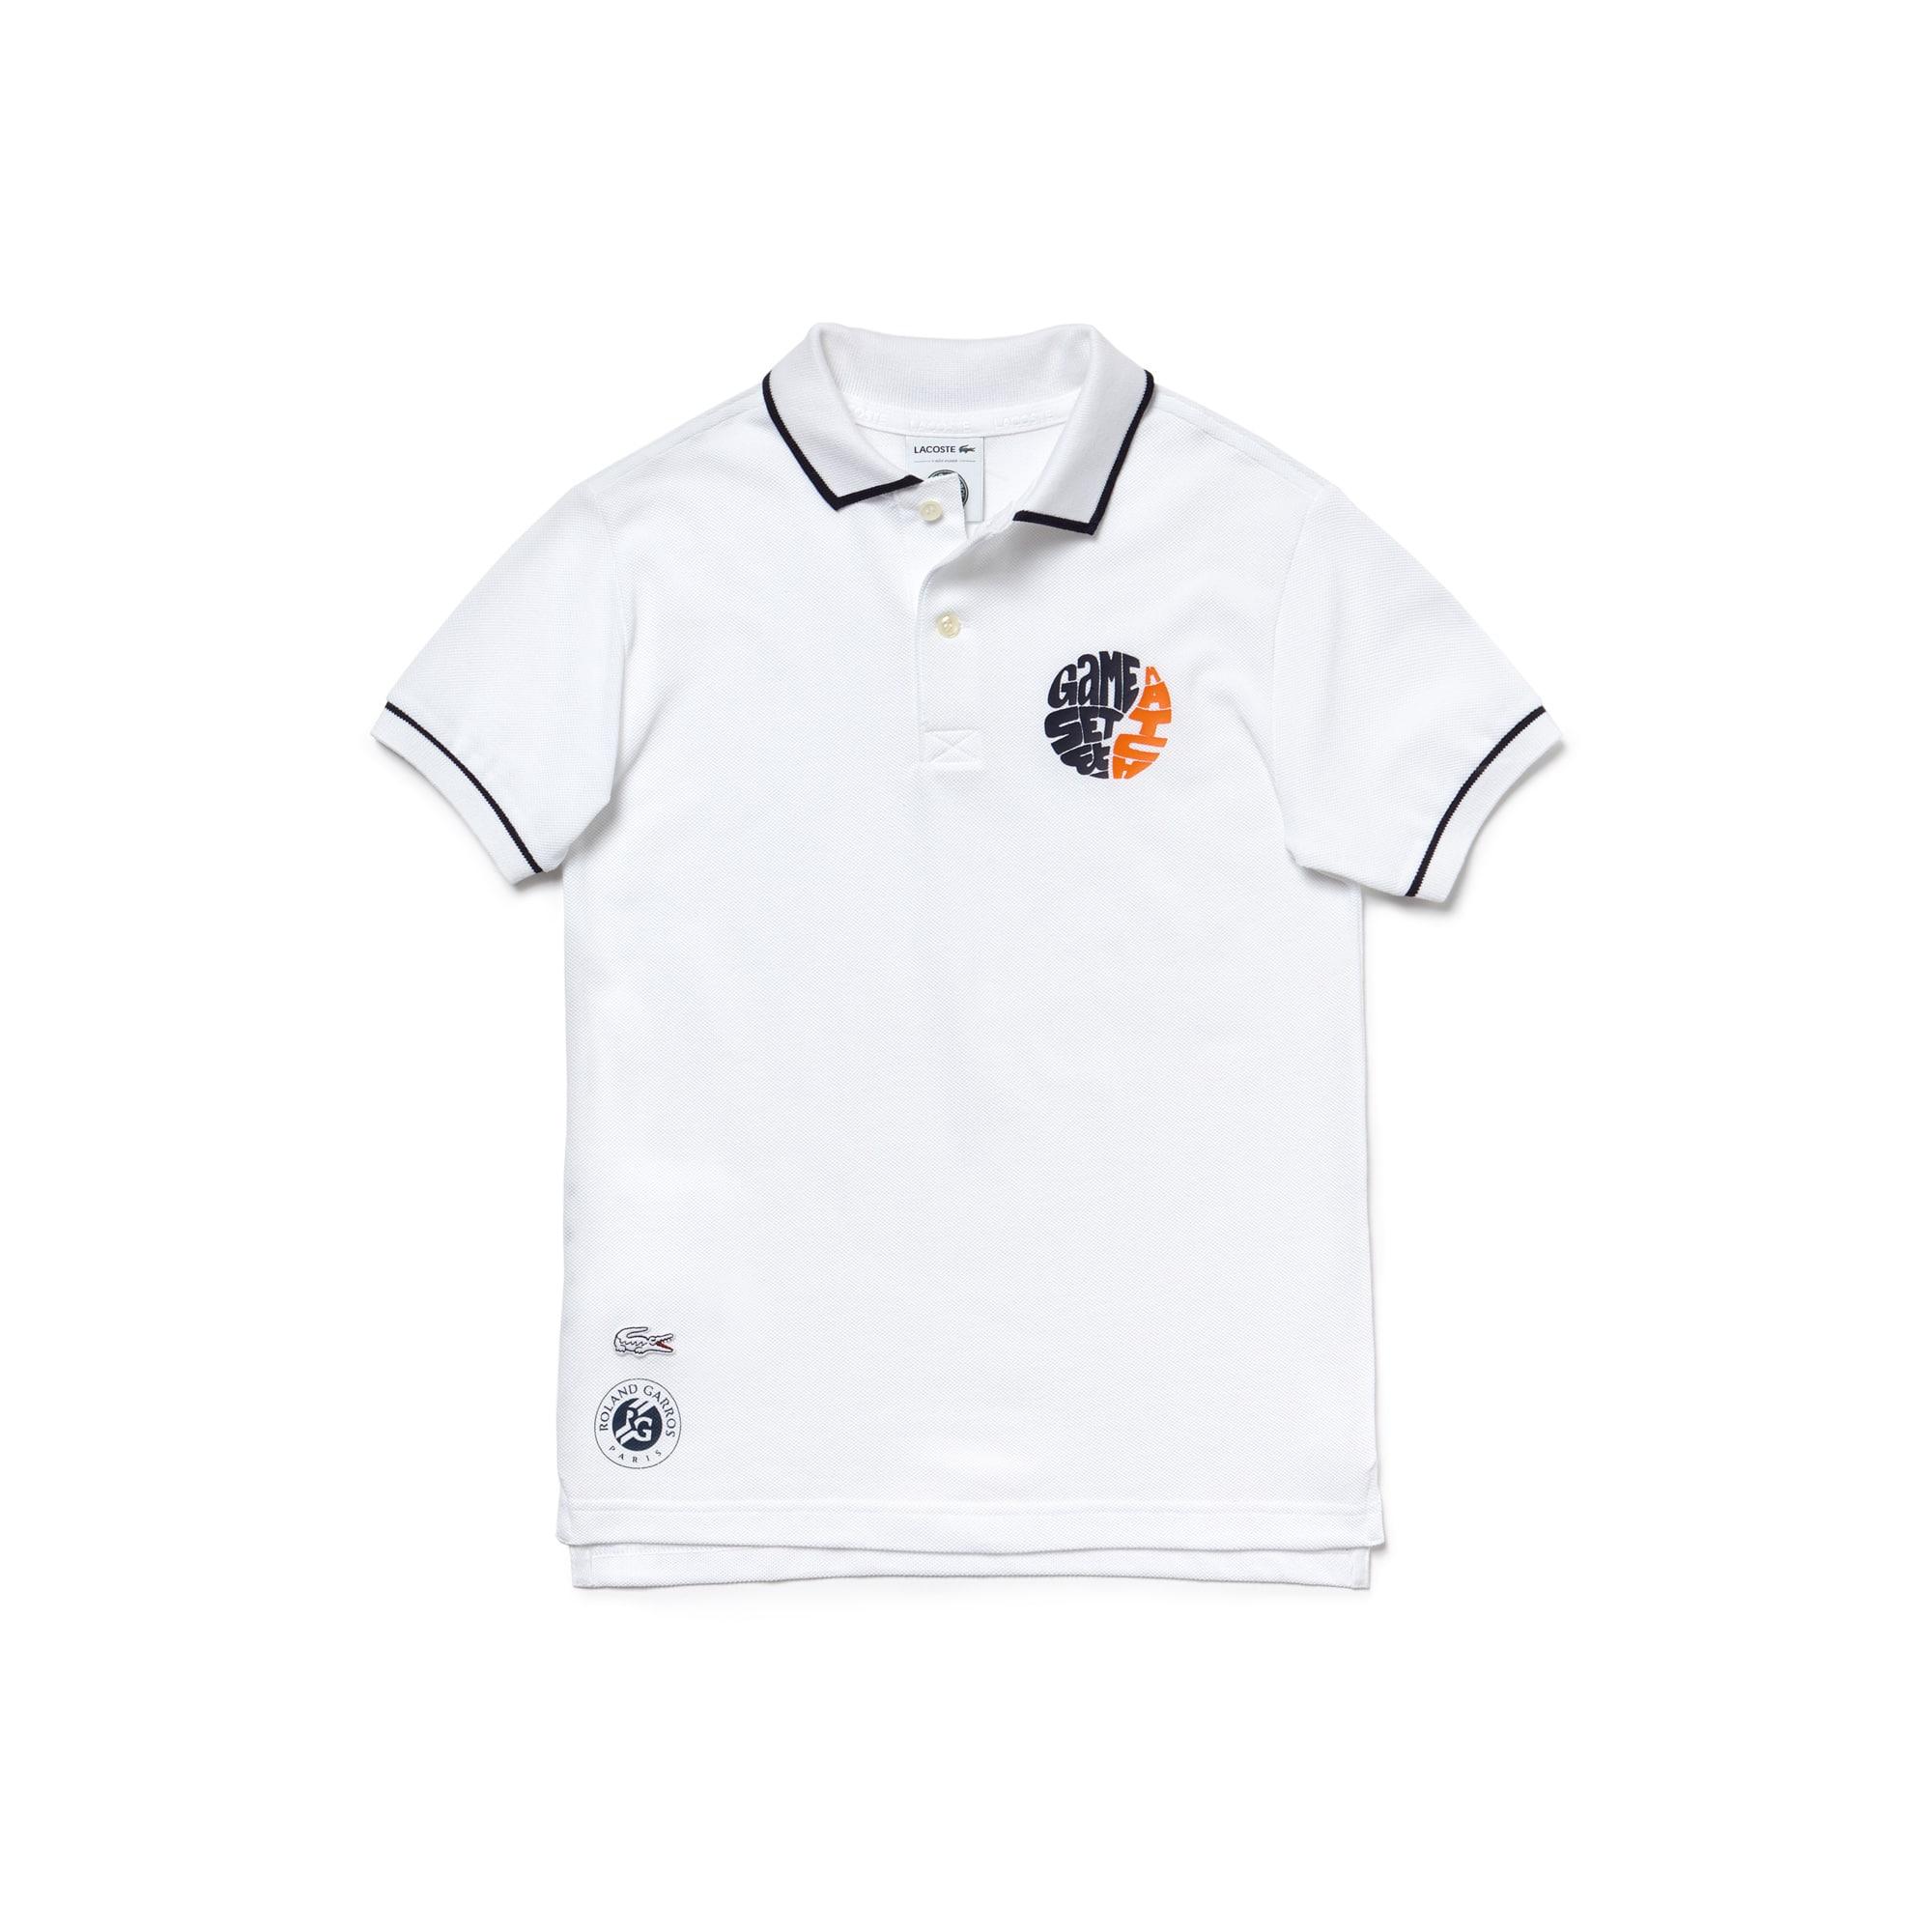 Jungen LACOSTE SPORT Roland Garros Edition Poloshirt